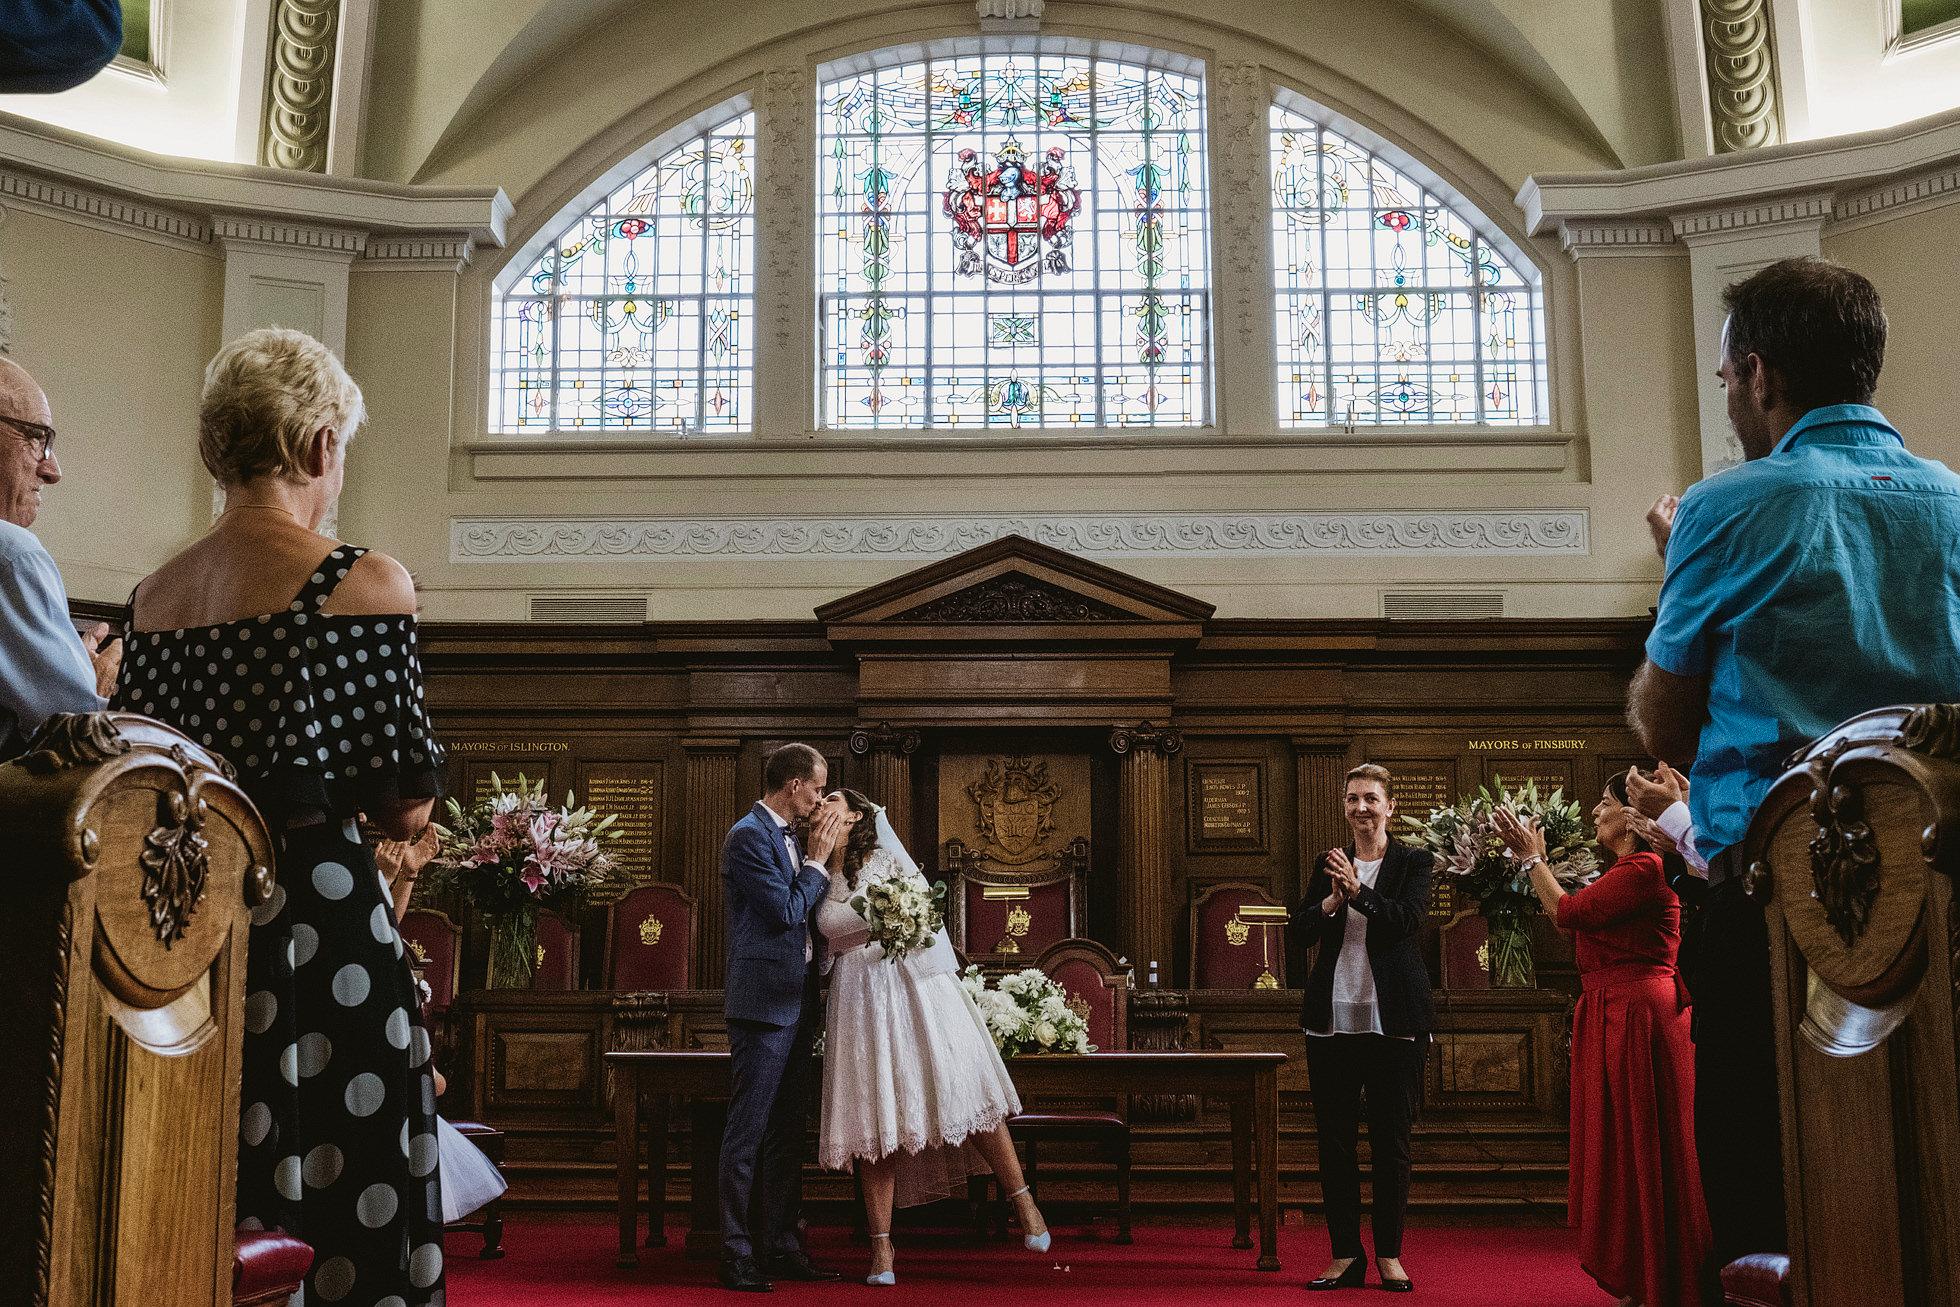 Islington Town Hall Wedding Photography - bride and groom kiss